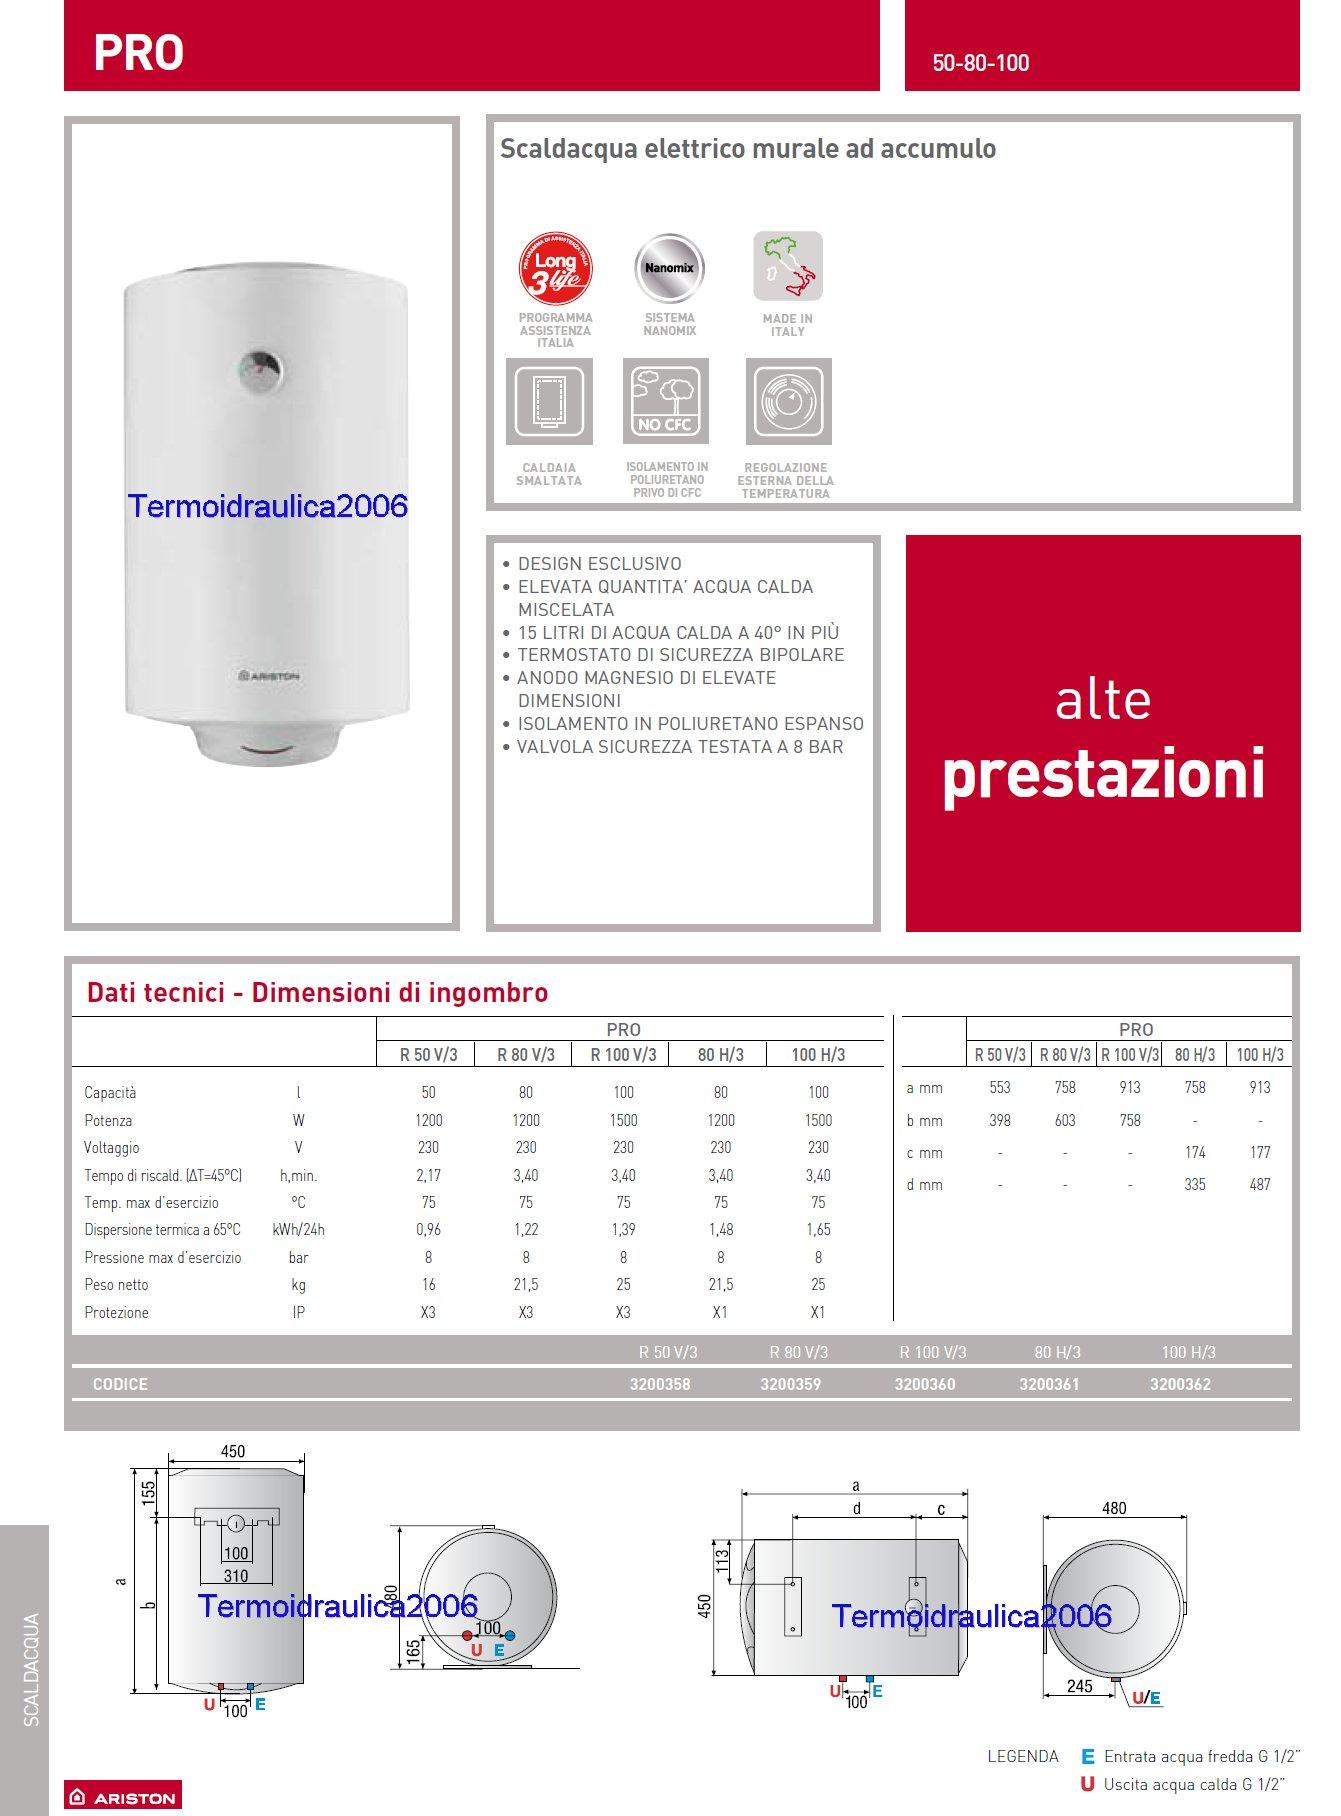 Ariston 3200361 pro r lt 80 h 3 scaldabagno elettrico orizzontale 30 for Scaldabagno elettrico ariston 50 litri prezzi